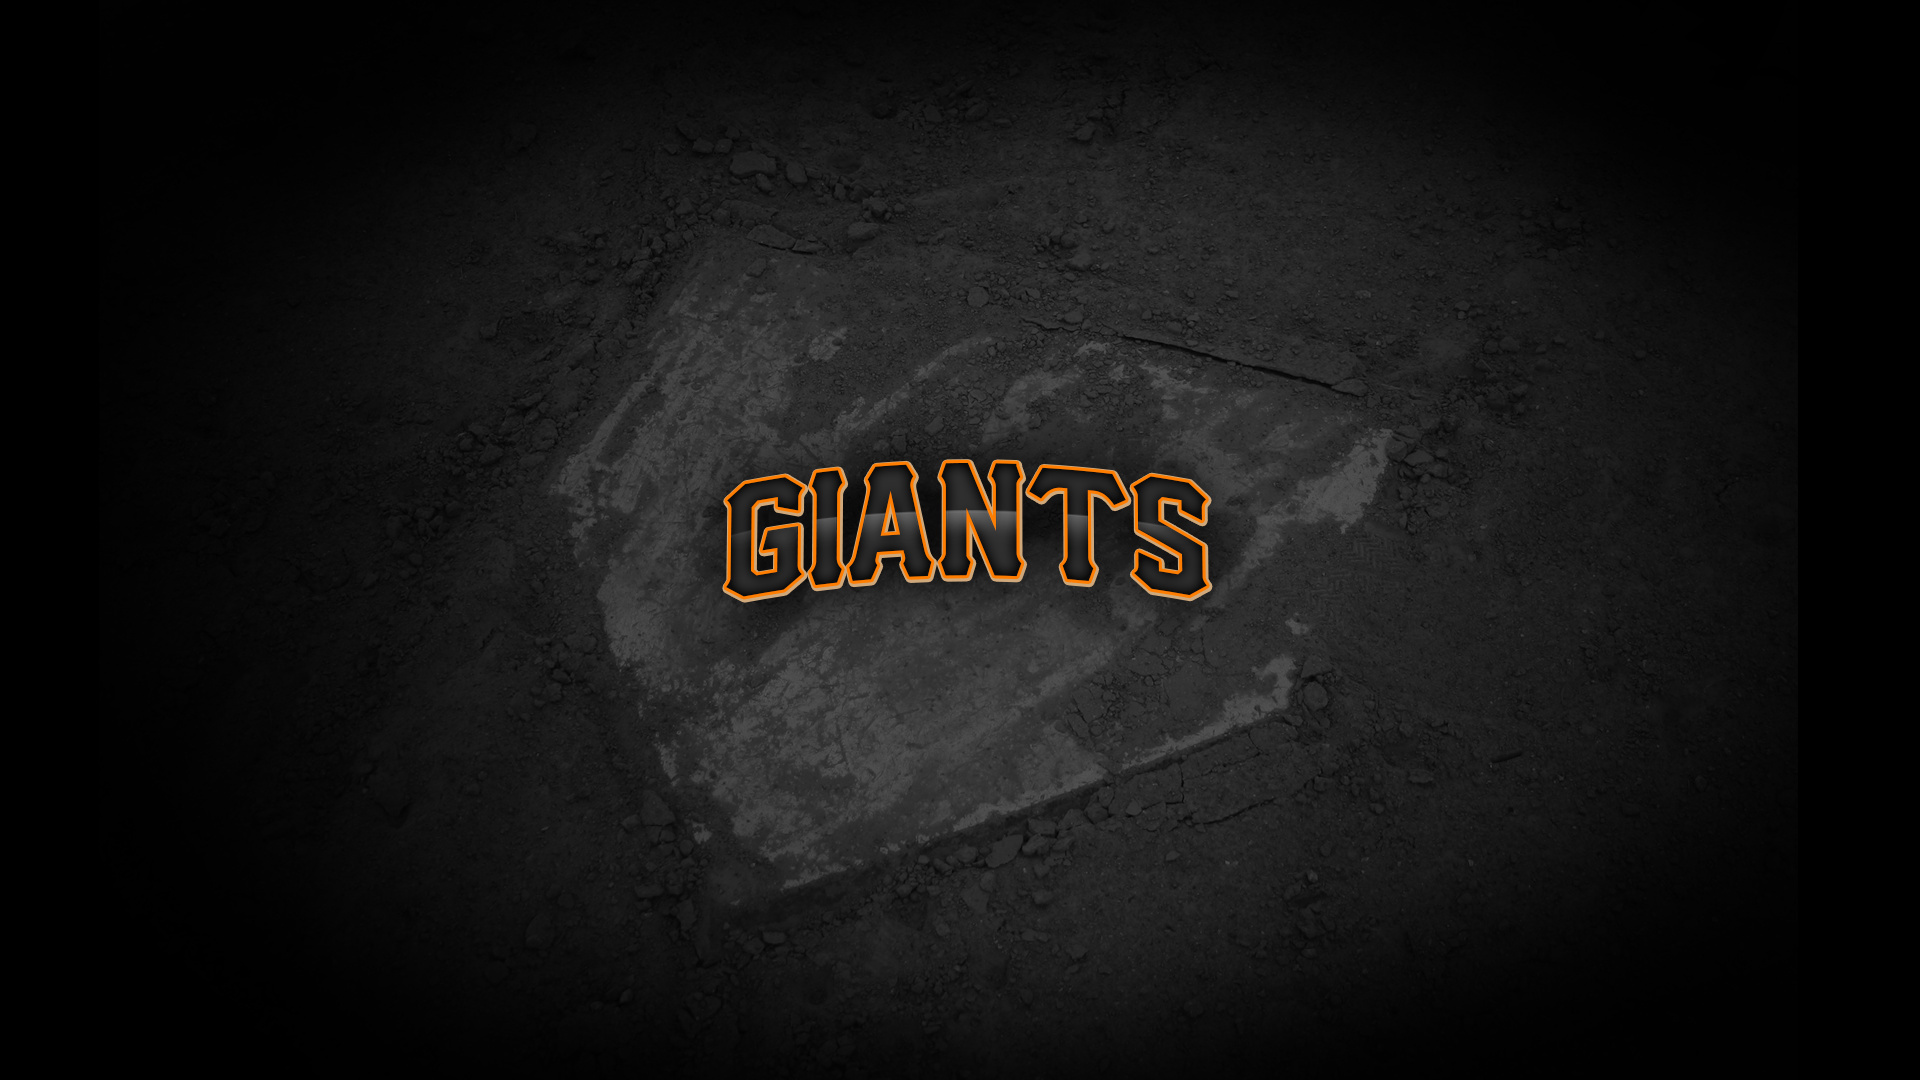 San Francisco Giants Logo Backgrounds HD 1920x1080